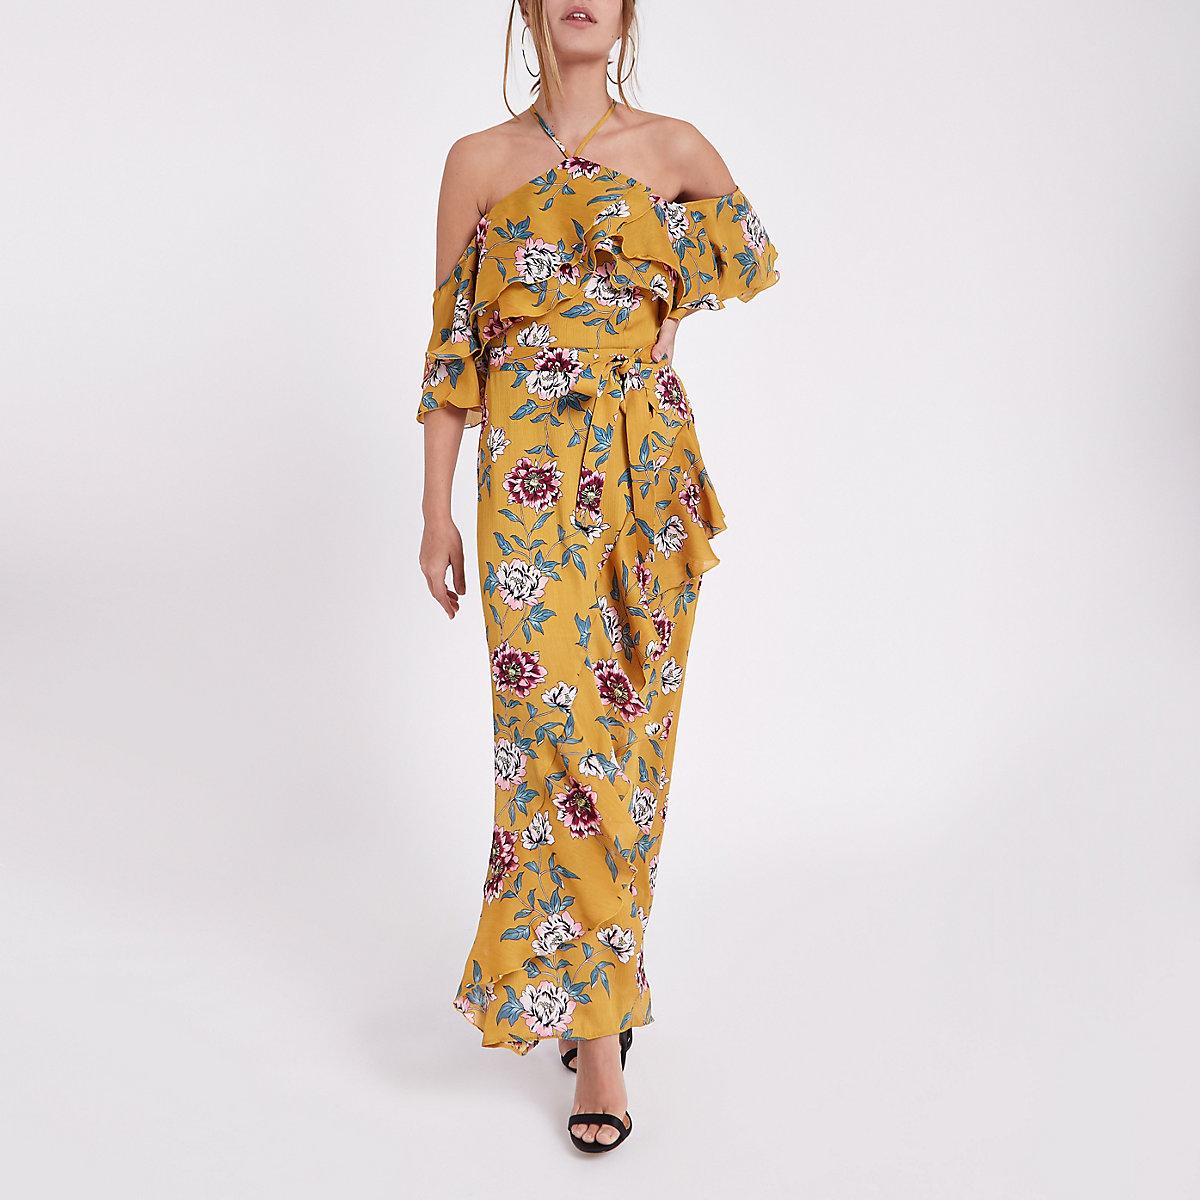 Petite yellow floral cold shoulder maxi dress